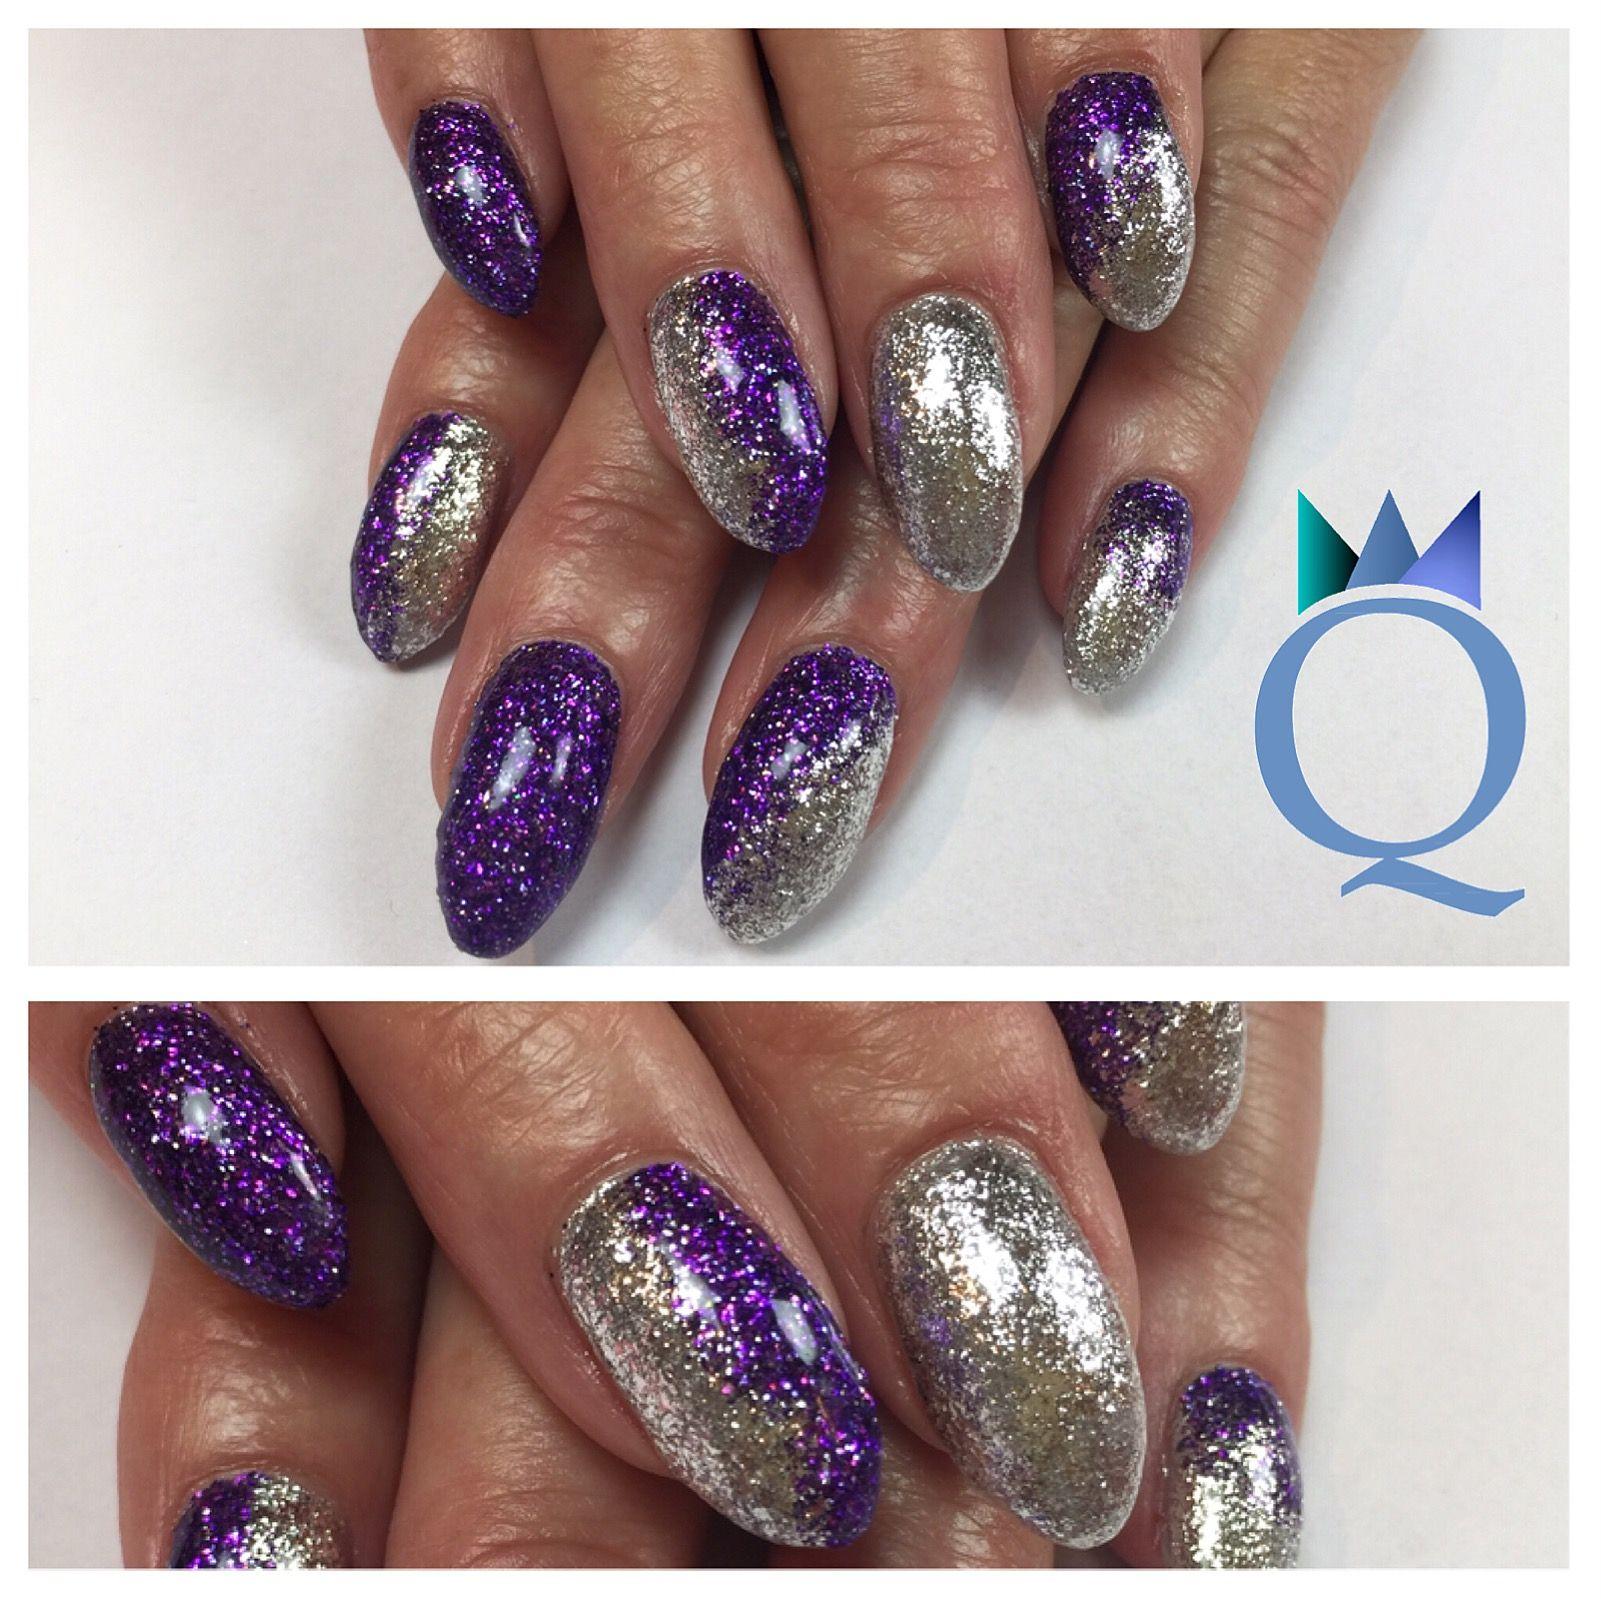 Almondnails Gelnails Nails Silver Purple Glitter Mandelform